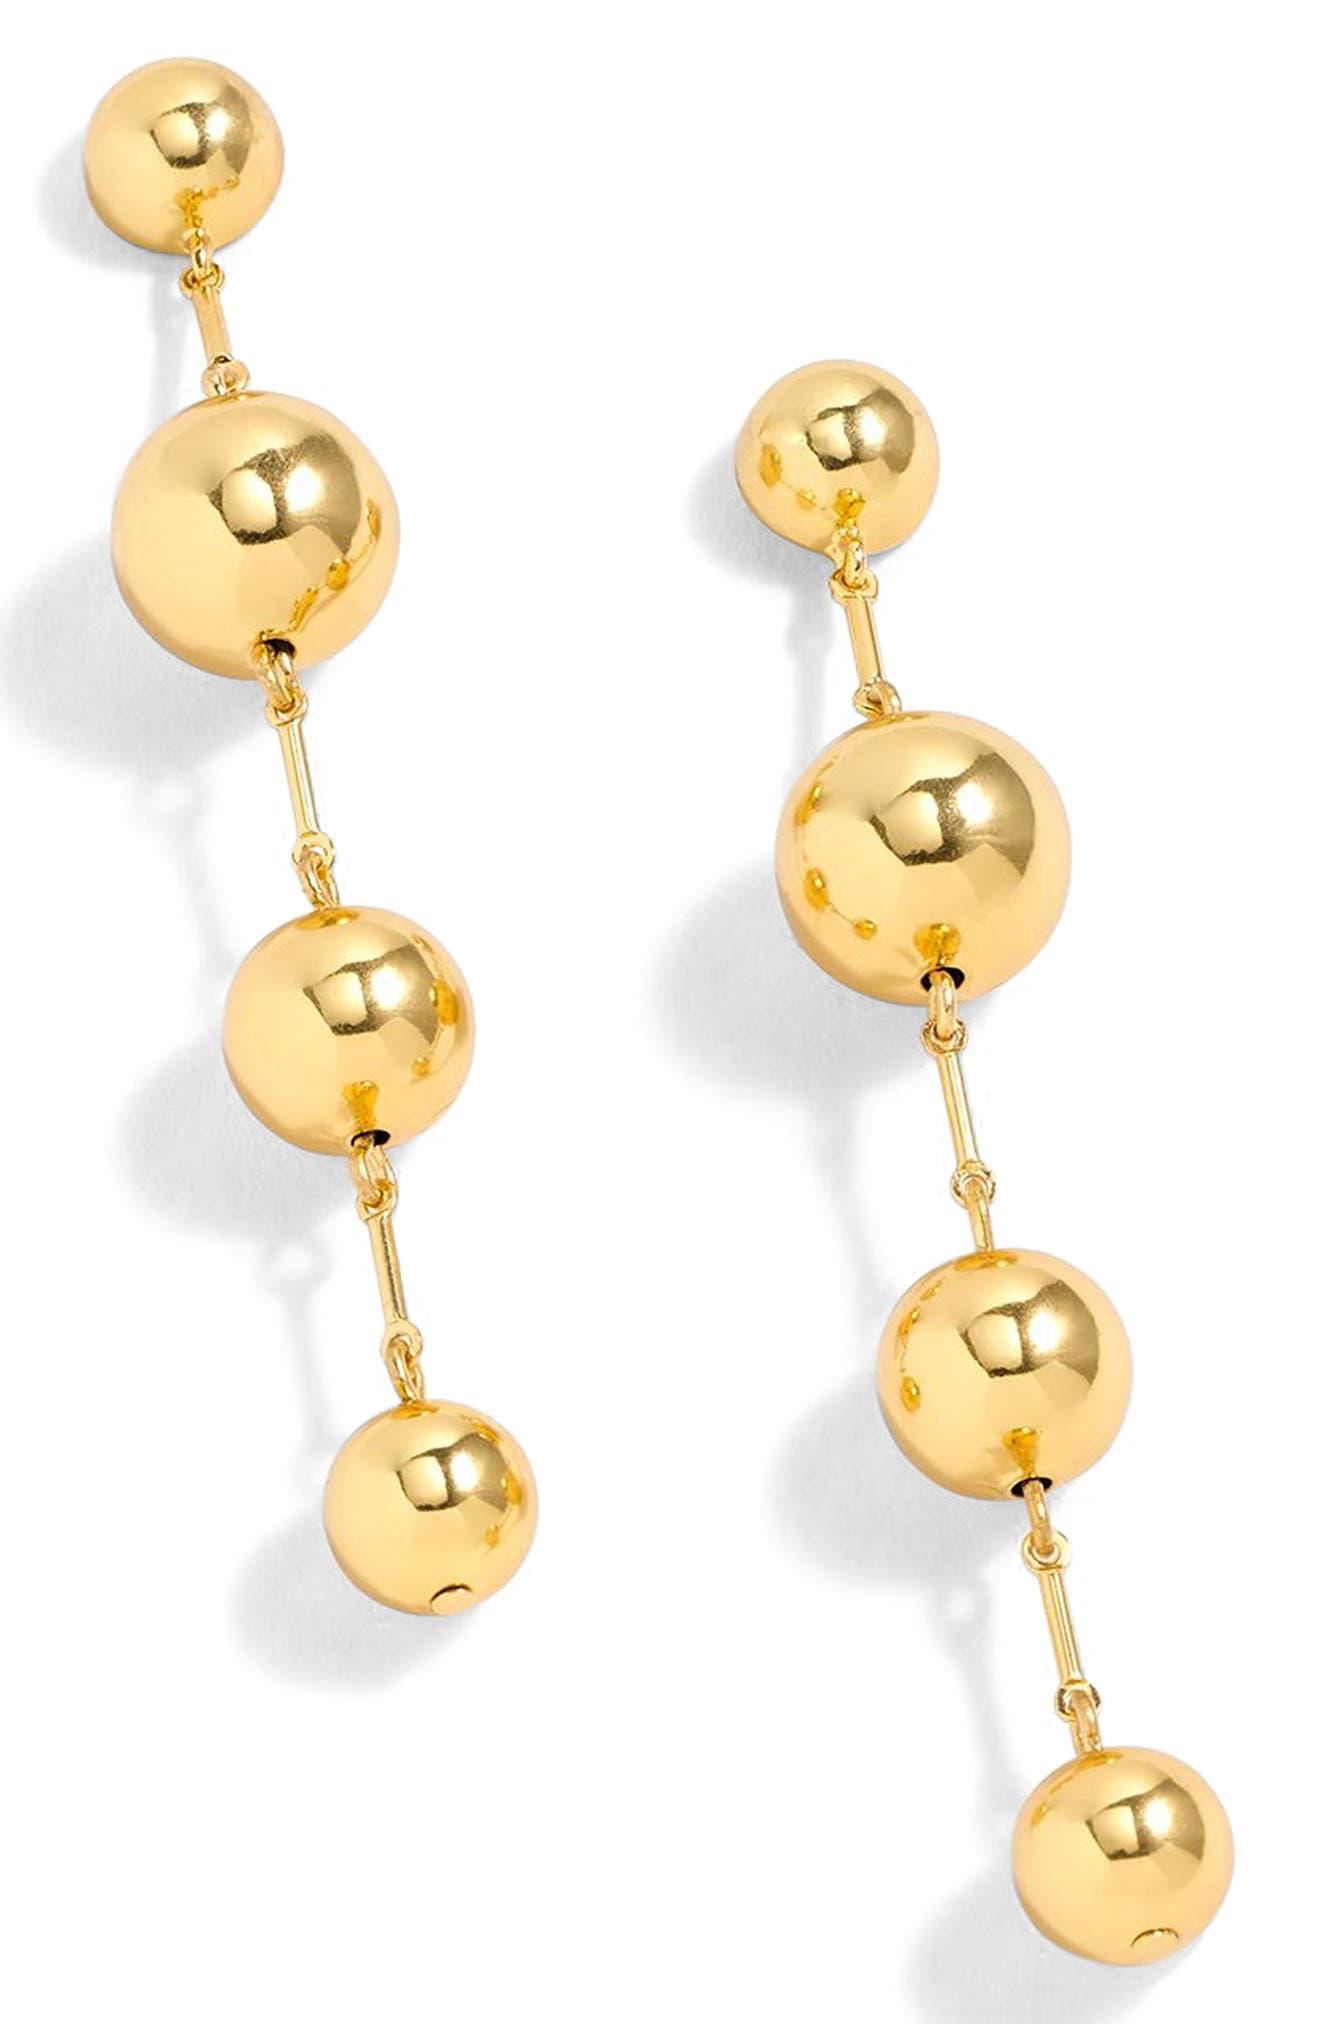 Ball Drop Earrings,                             Main thumbnail 1, color,                             Gold